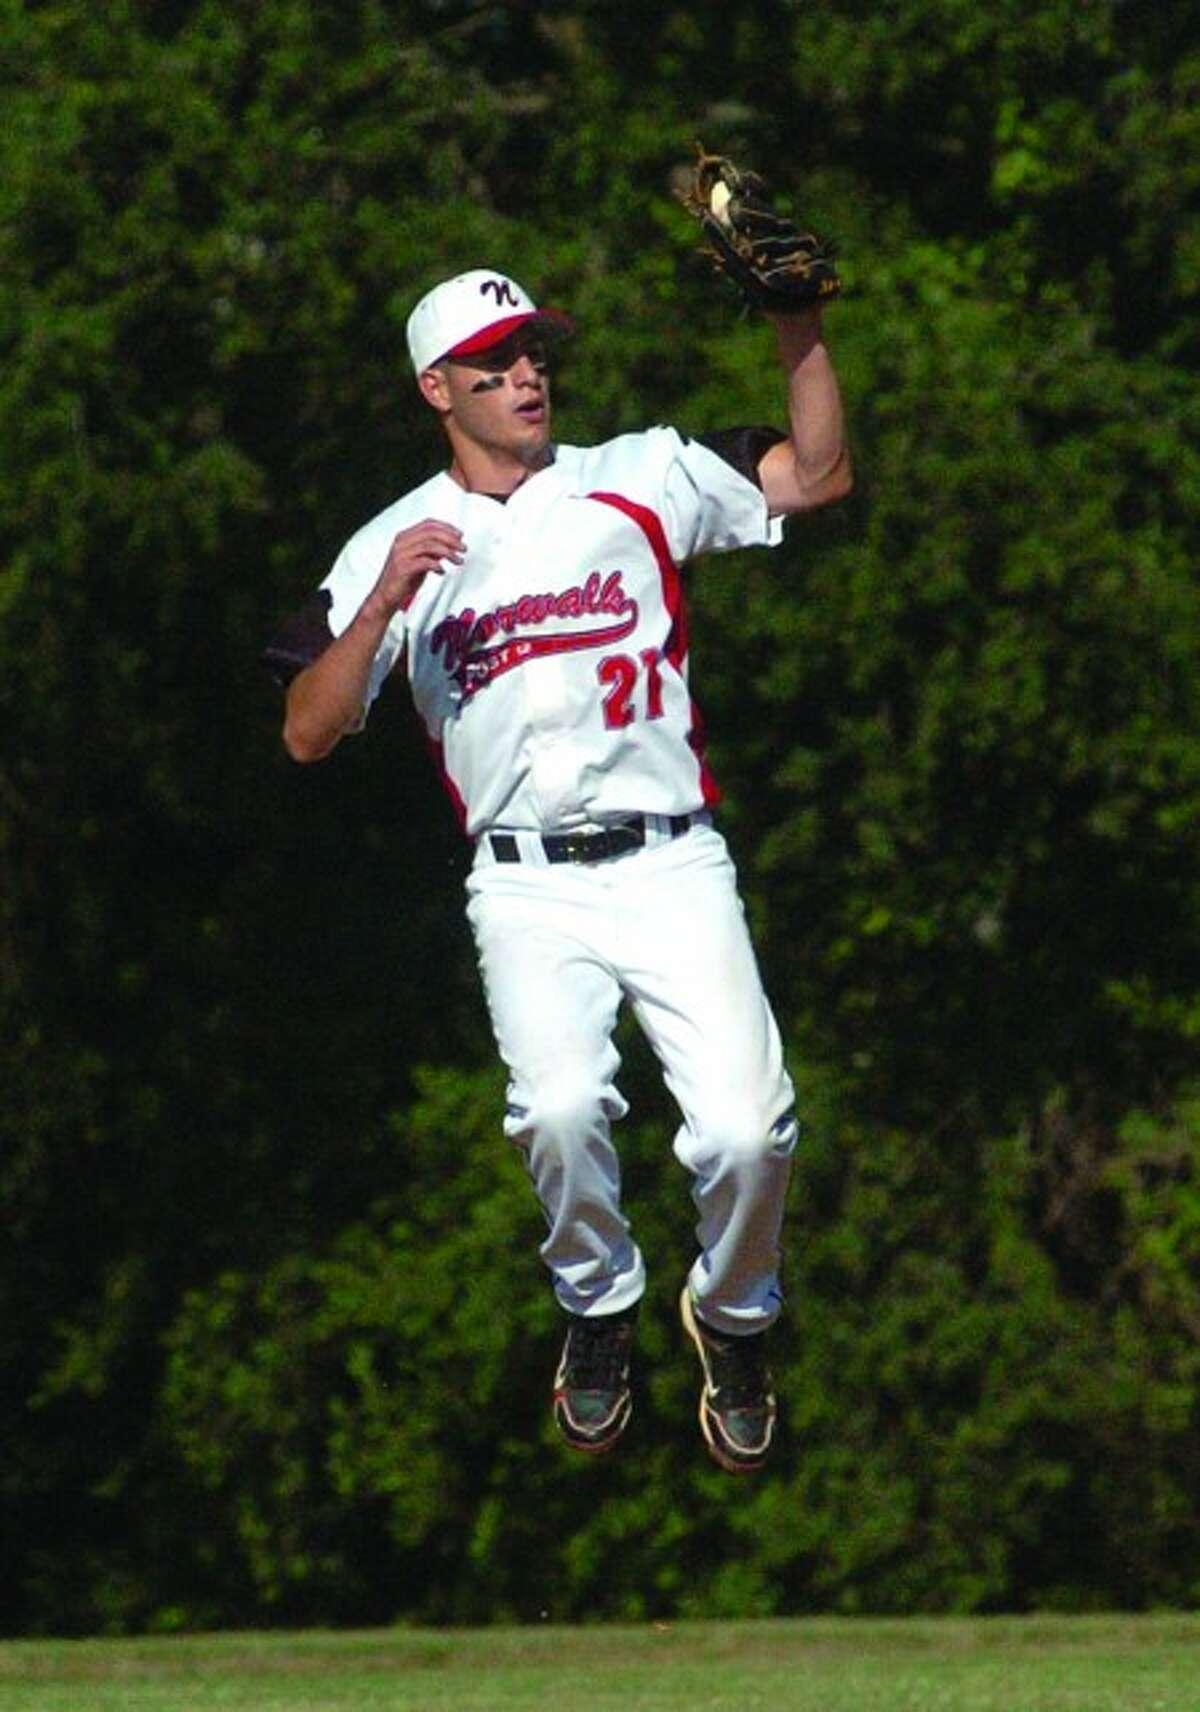 Eric Stenger legion baseball vs. Darien. hour photo/matthew vinci